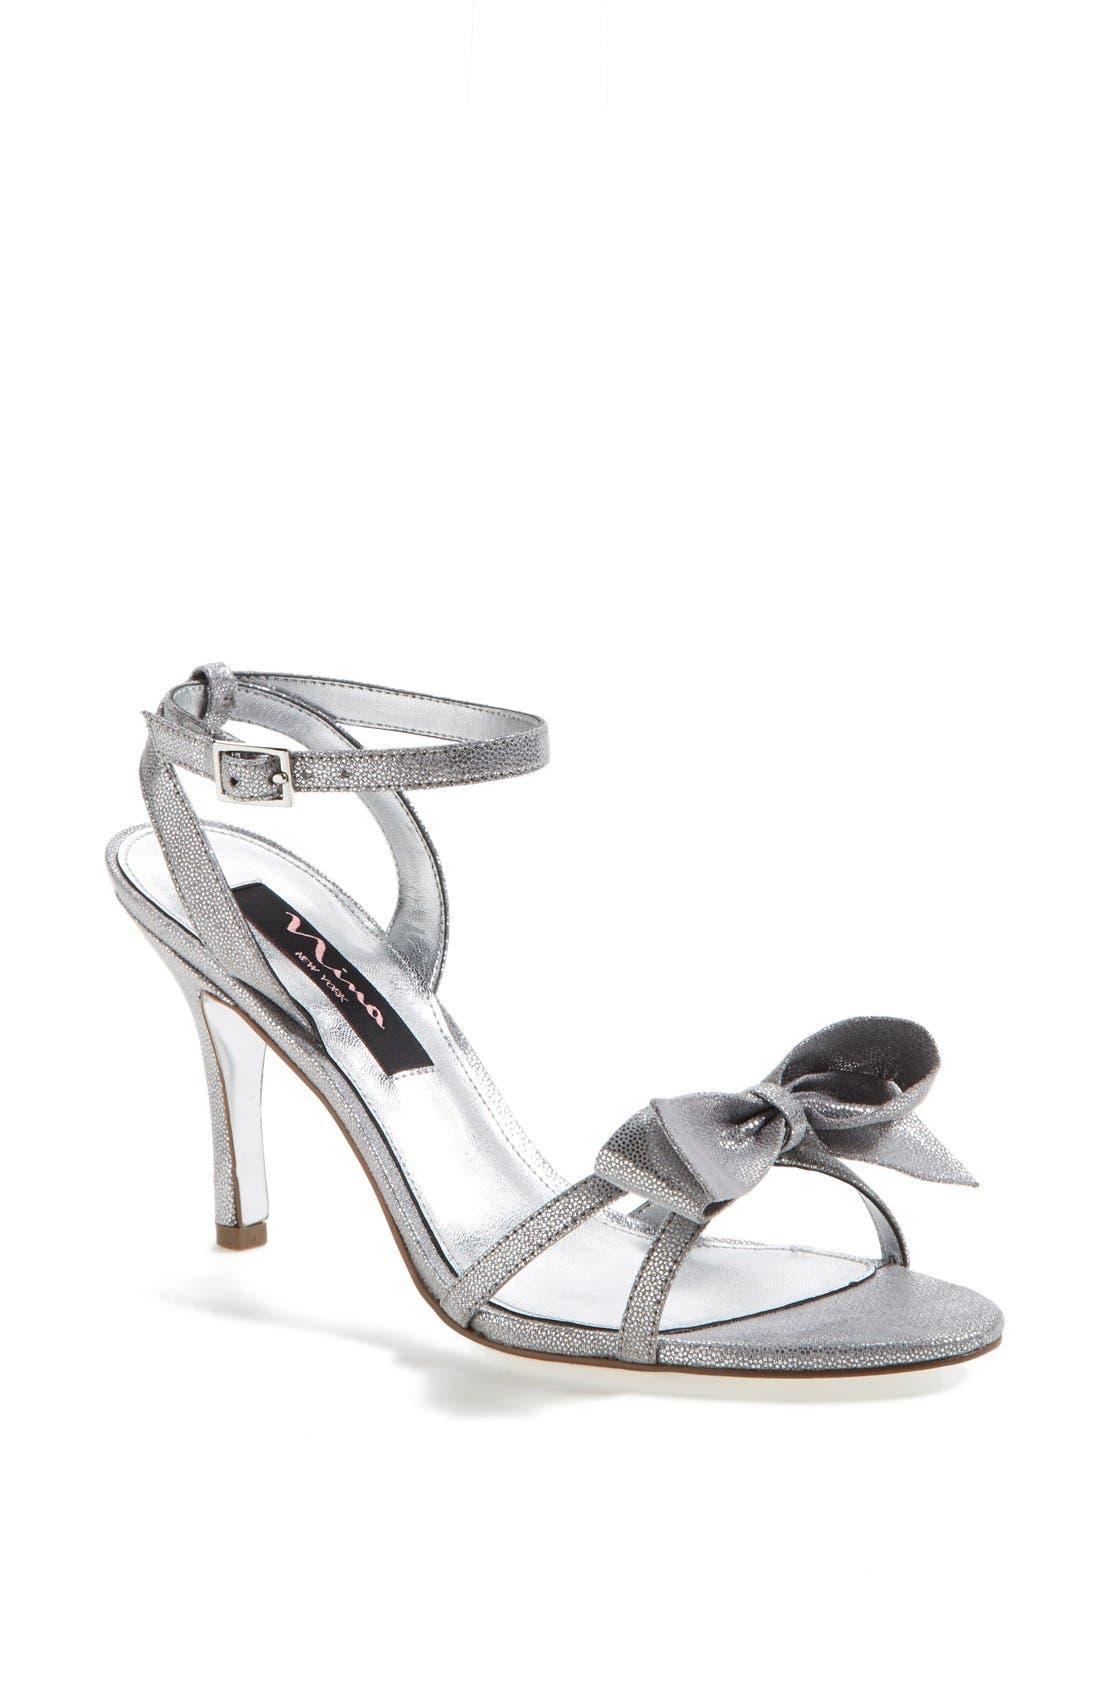 Main Image - Nina 'Vianna' Satin Bow Sandal